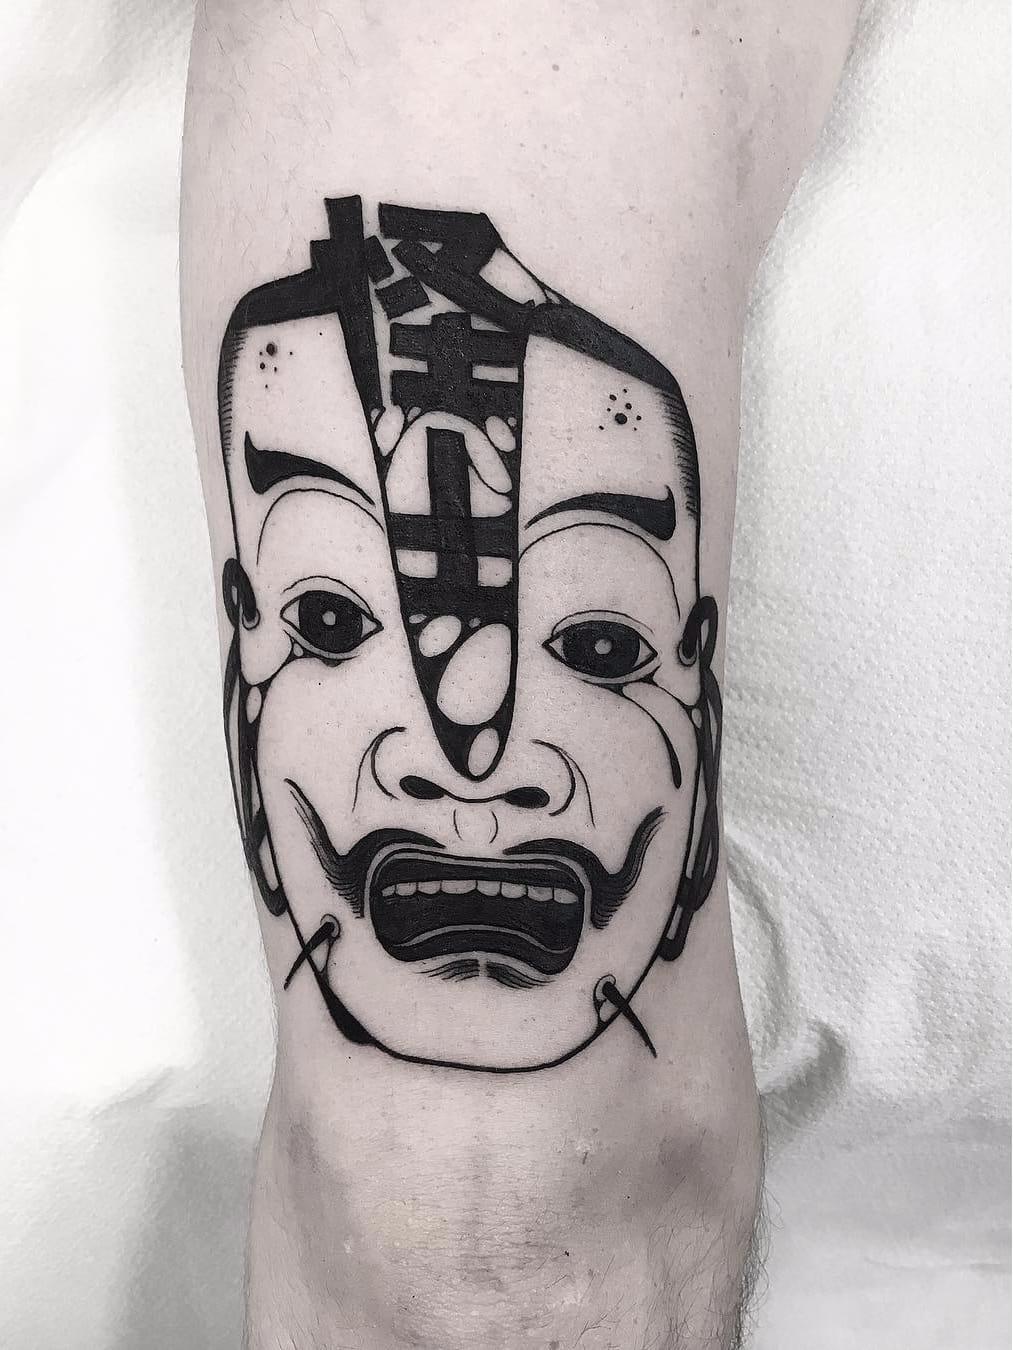 Por Oscar Hove #OscarHove #gringo #blackwork #oriental #rosto #face #mask #mascara #nohmask #noh #mascarajaponesa #japanesemask